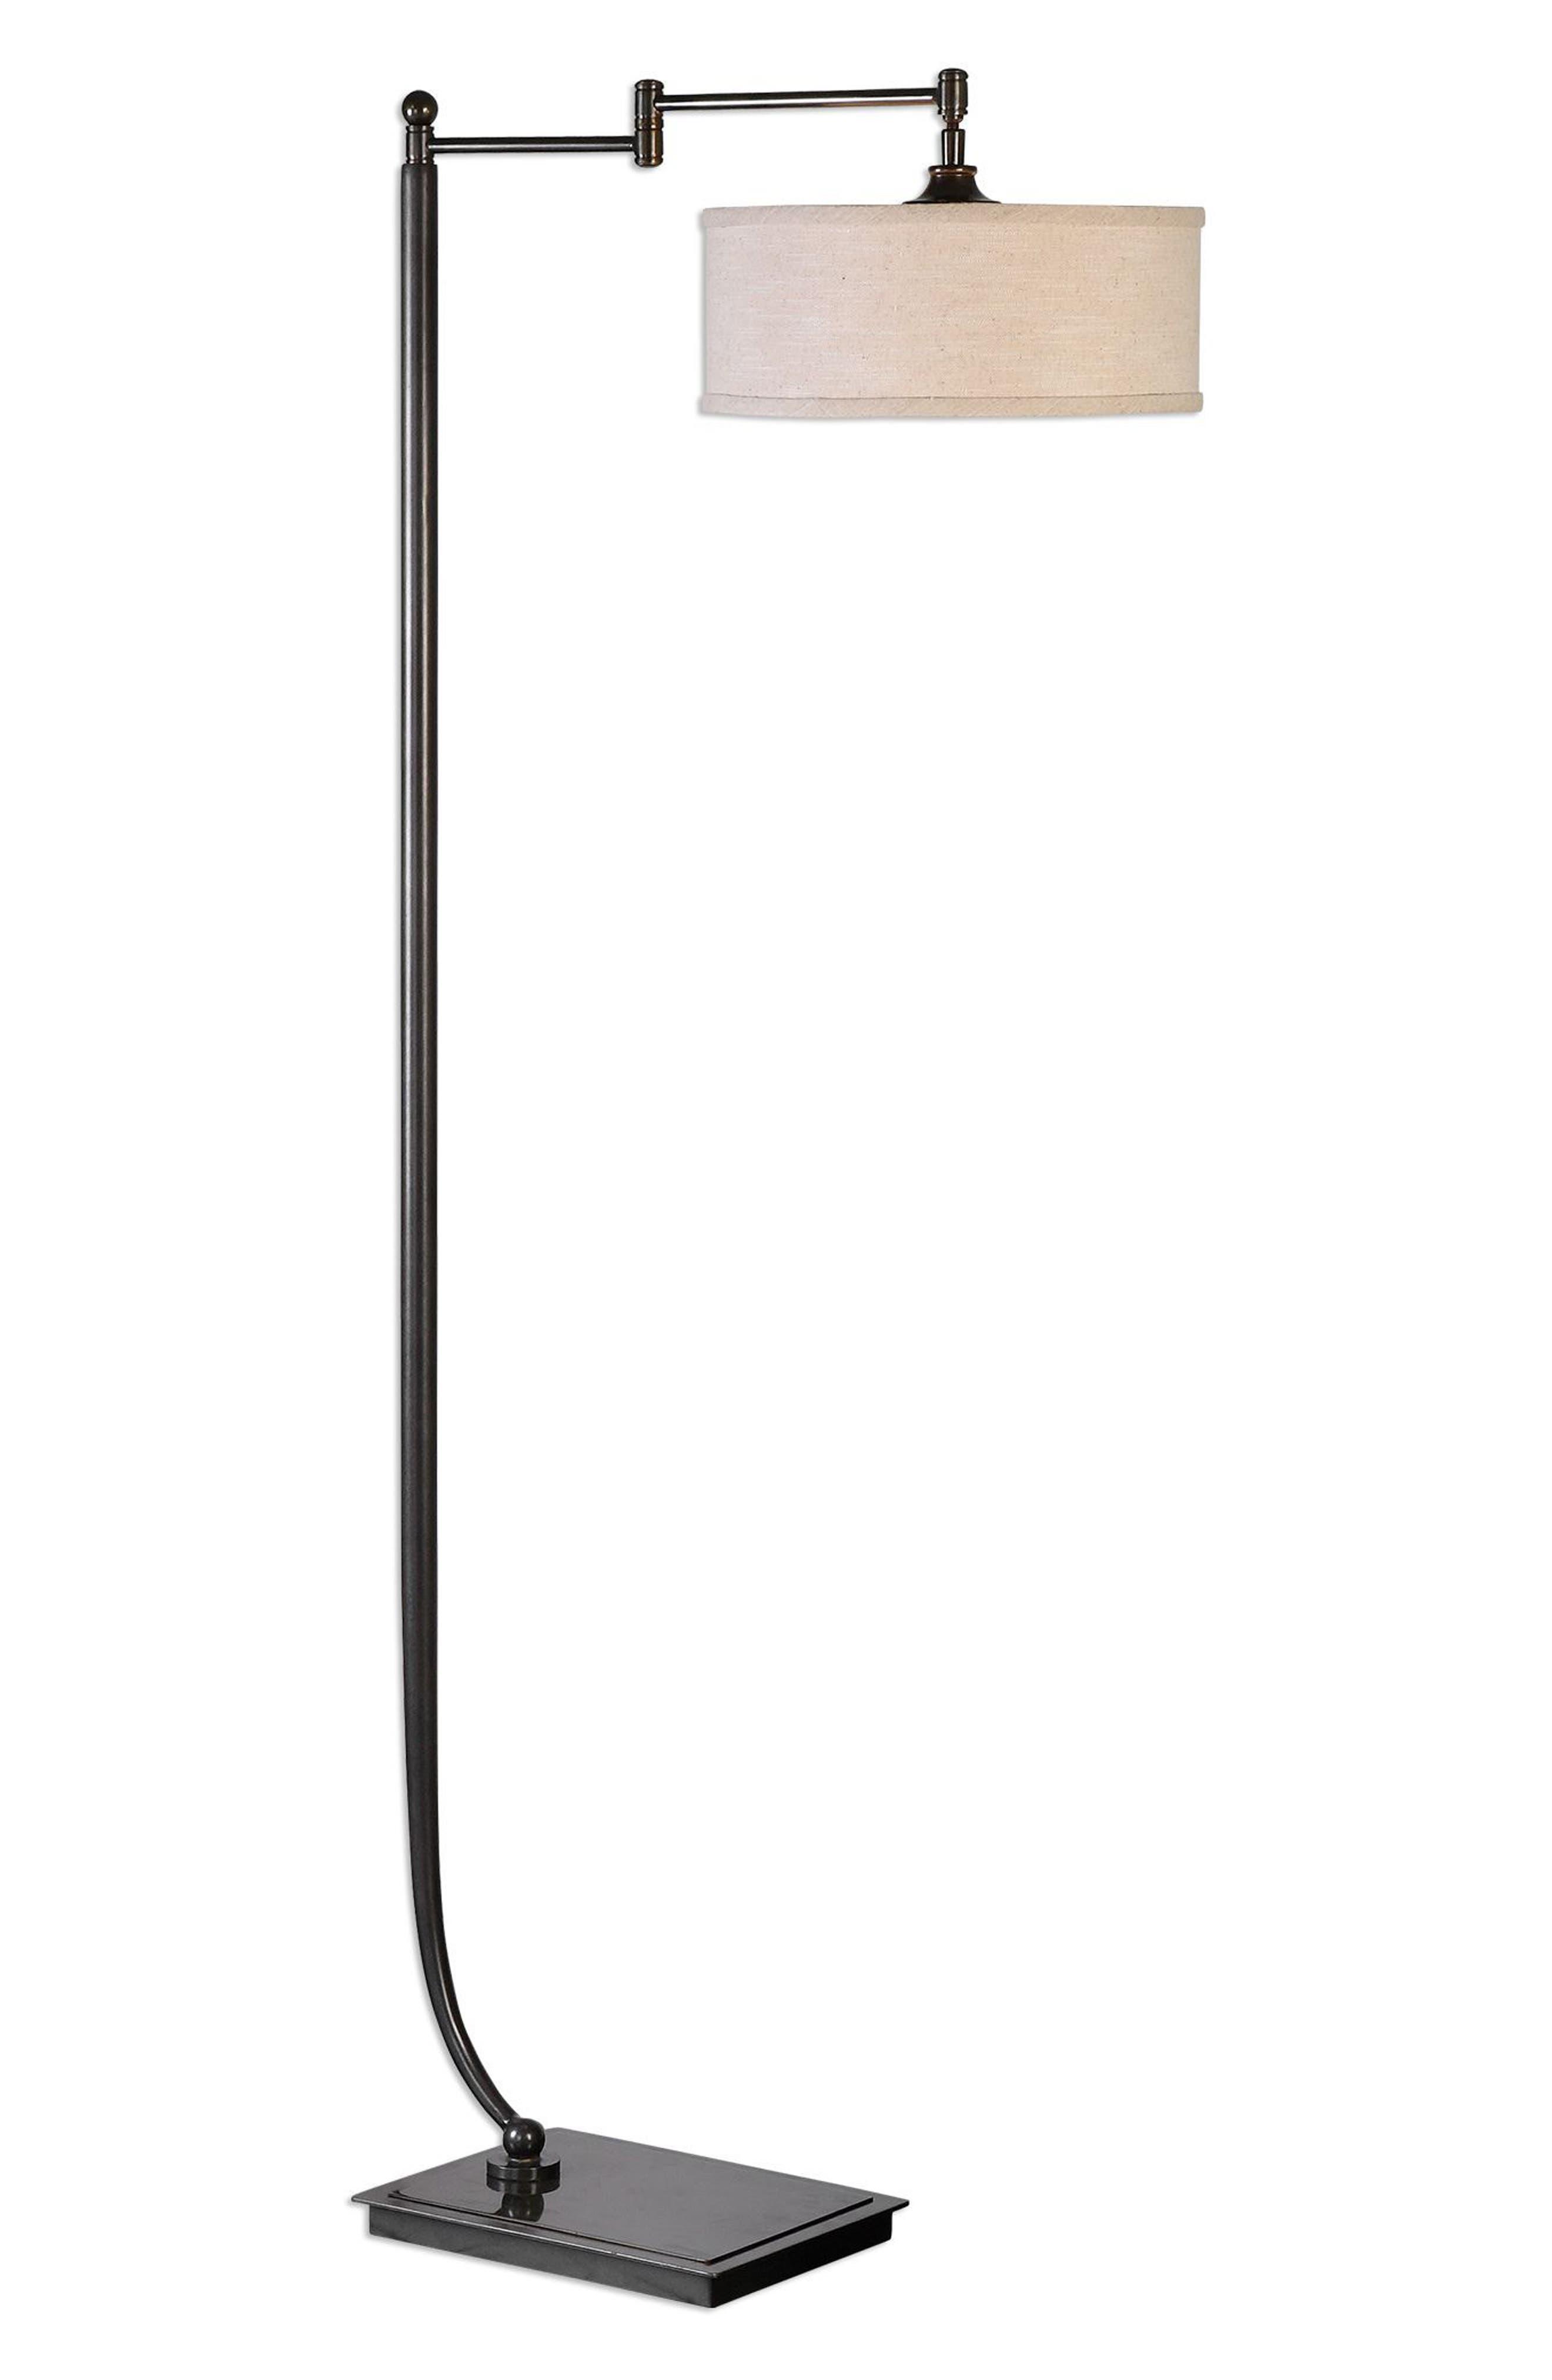 Lamine Floor Lamp,                             Main thumbnail 1, color,                             200